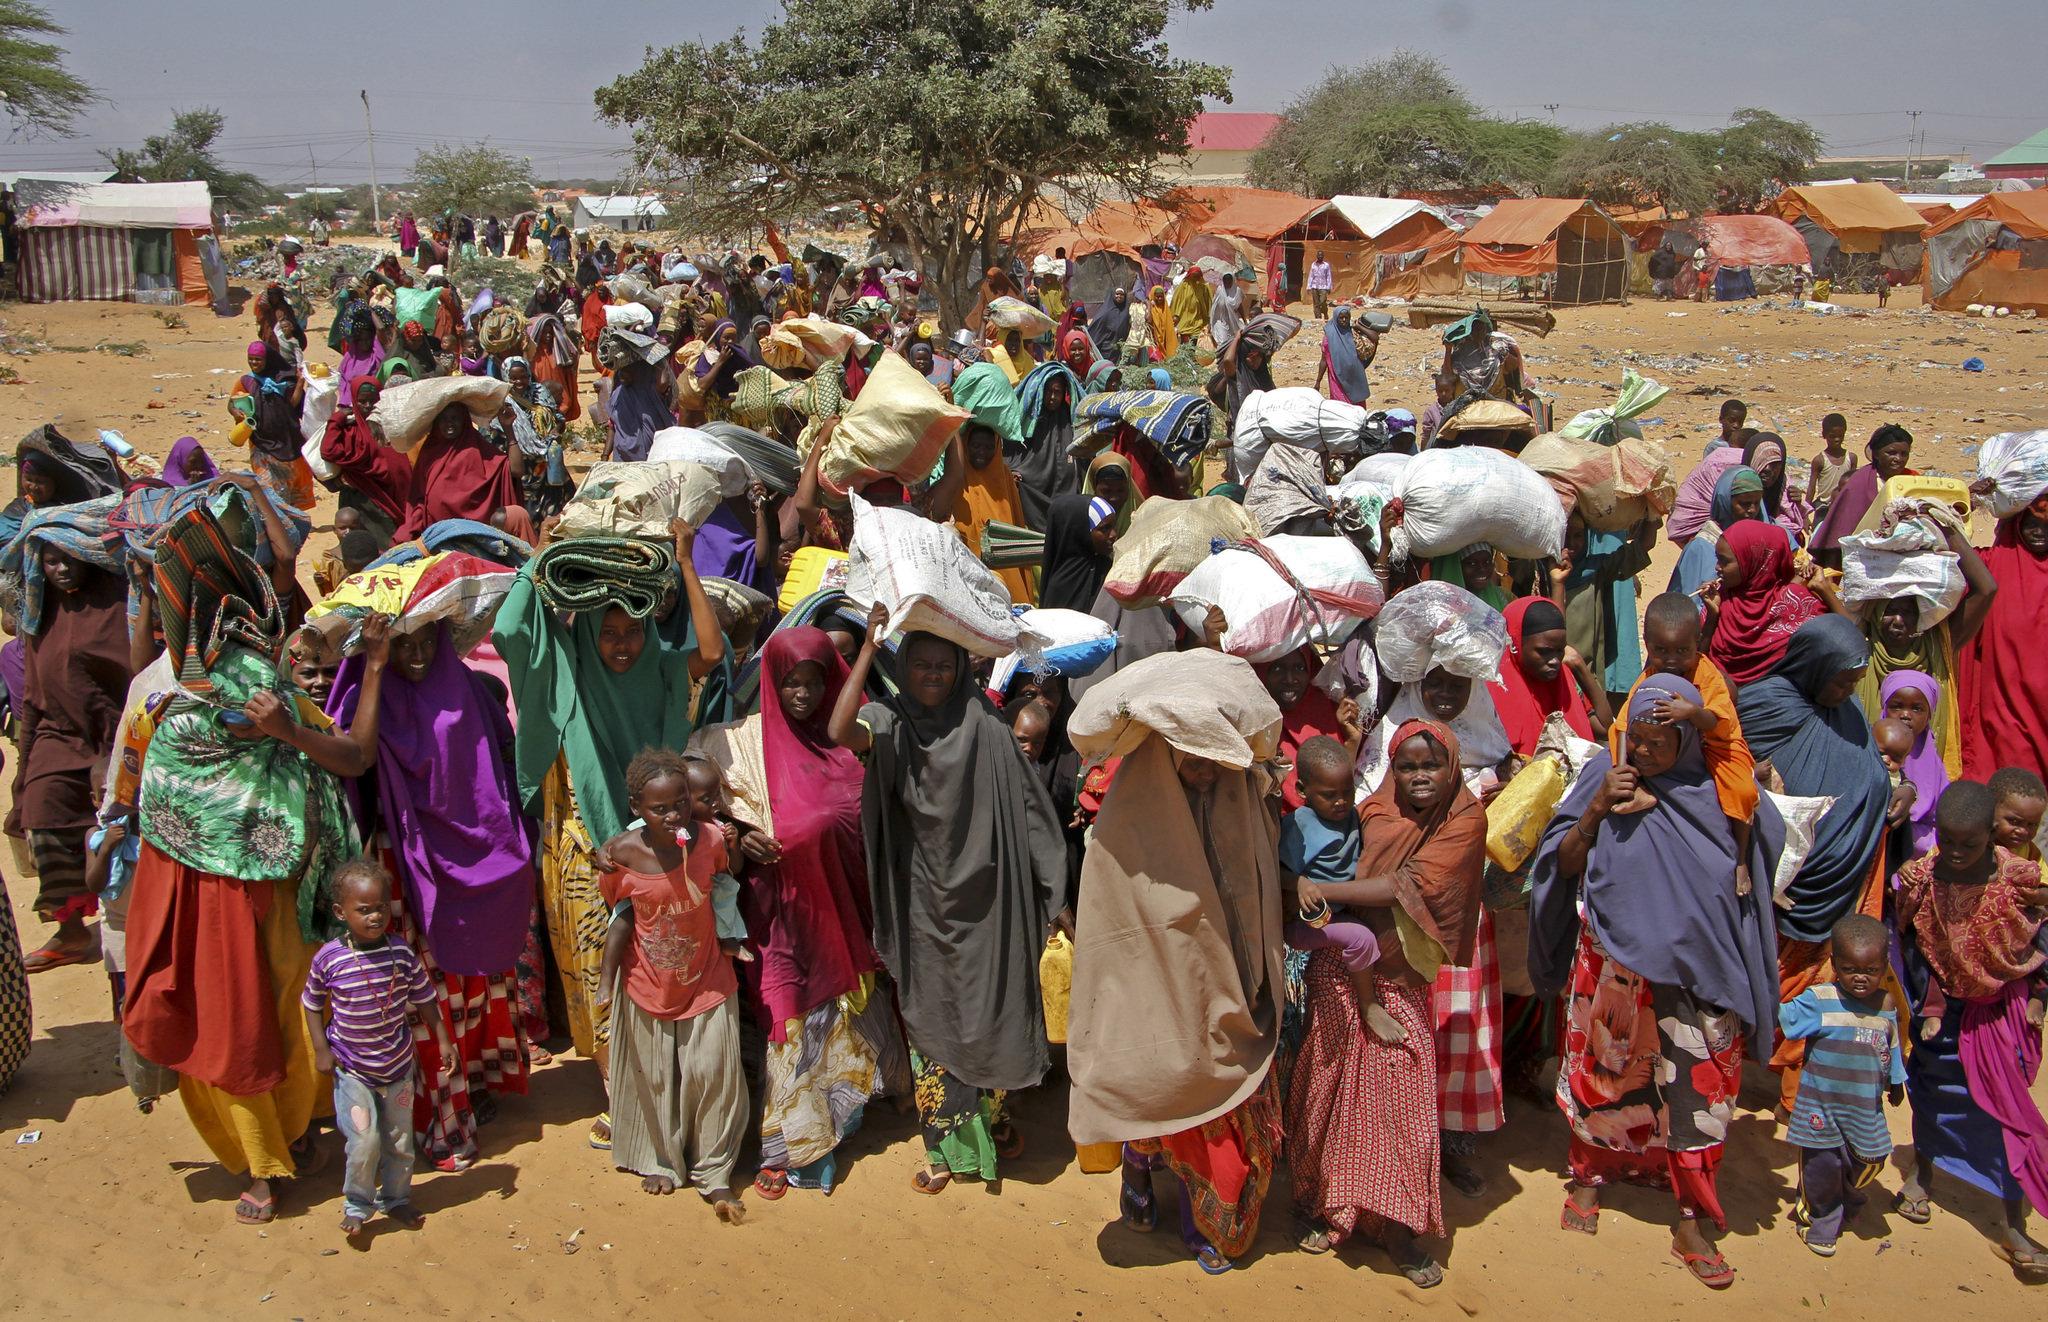 https://i0.wp.com/media.cleveland.com/opinion_impact/photo/somalia-us-military-a0a8b1ecee8c4c5a.jpg